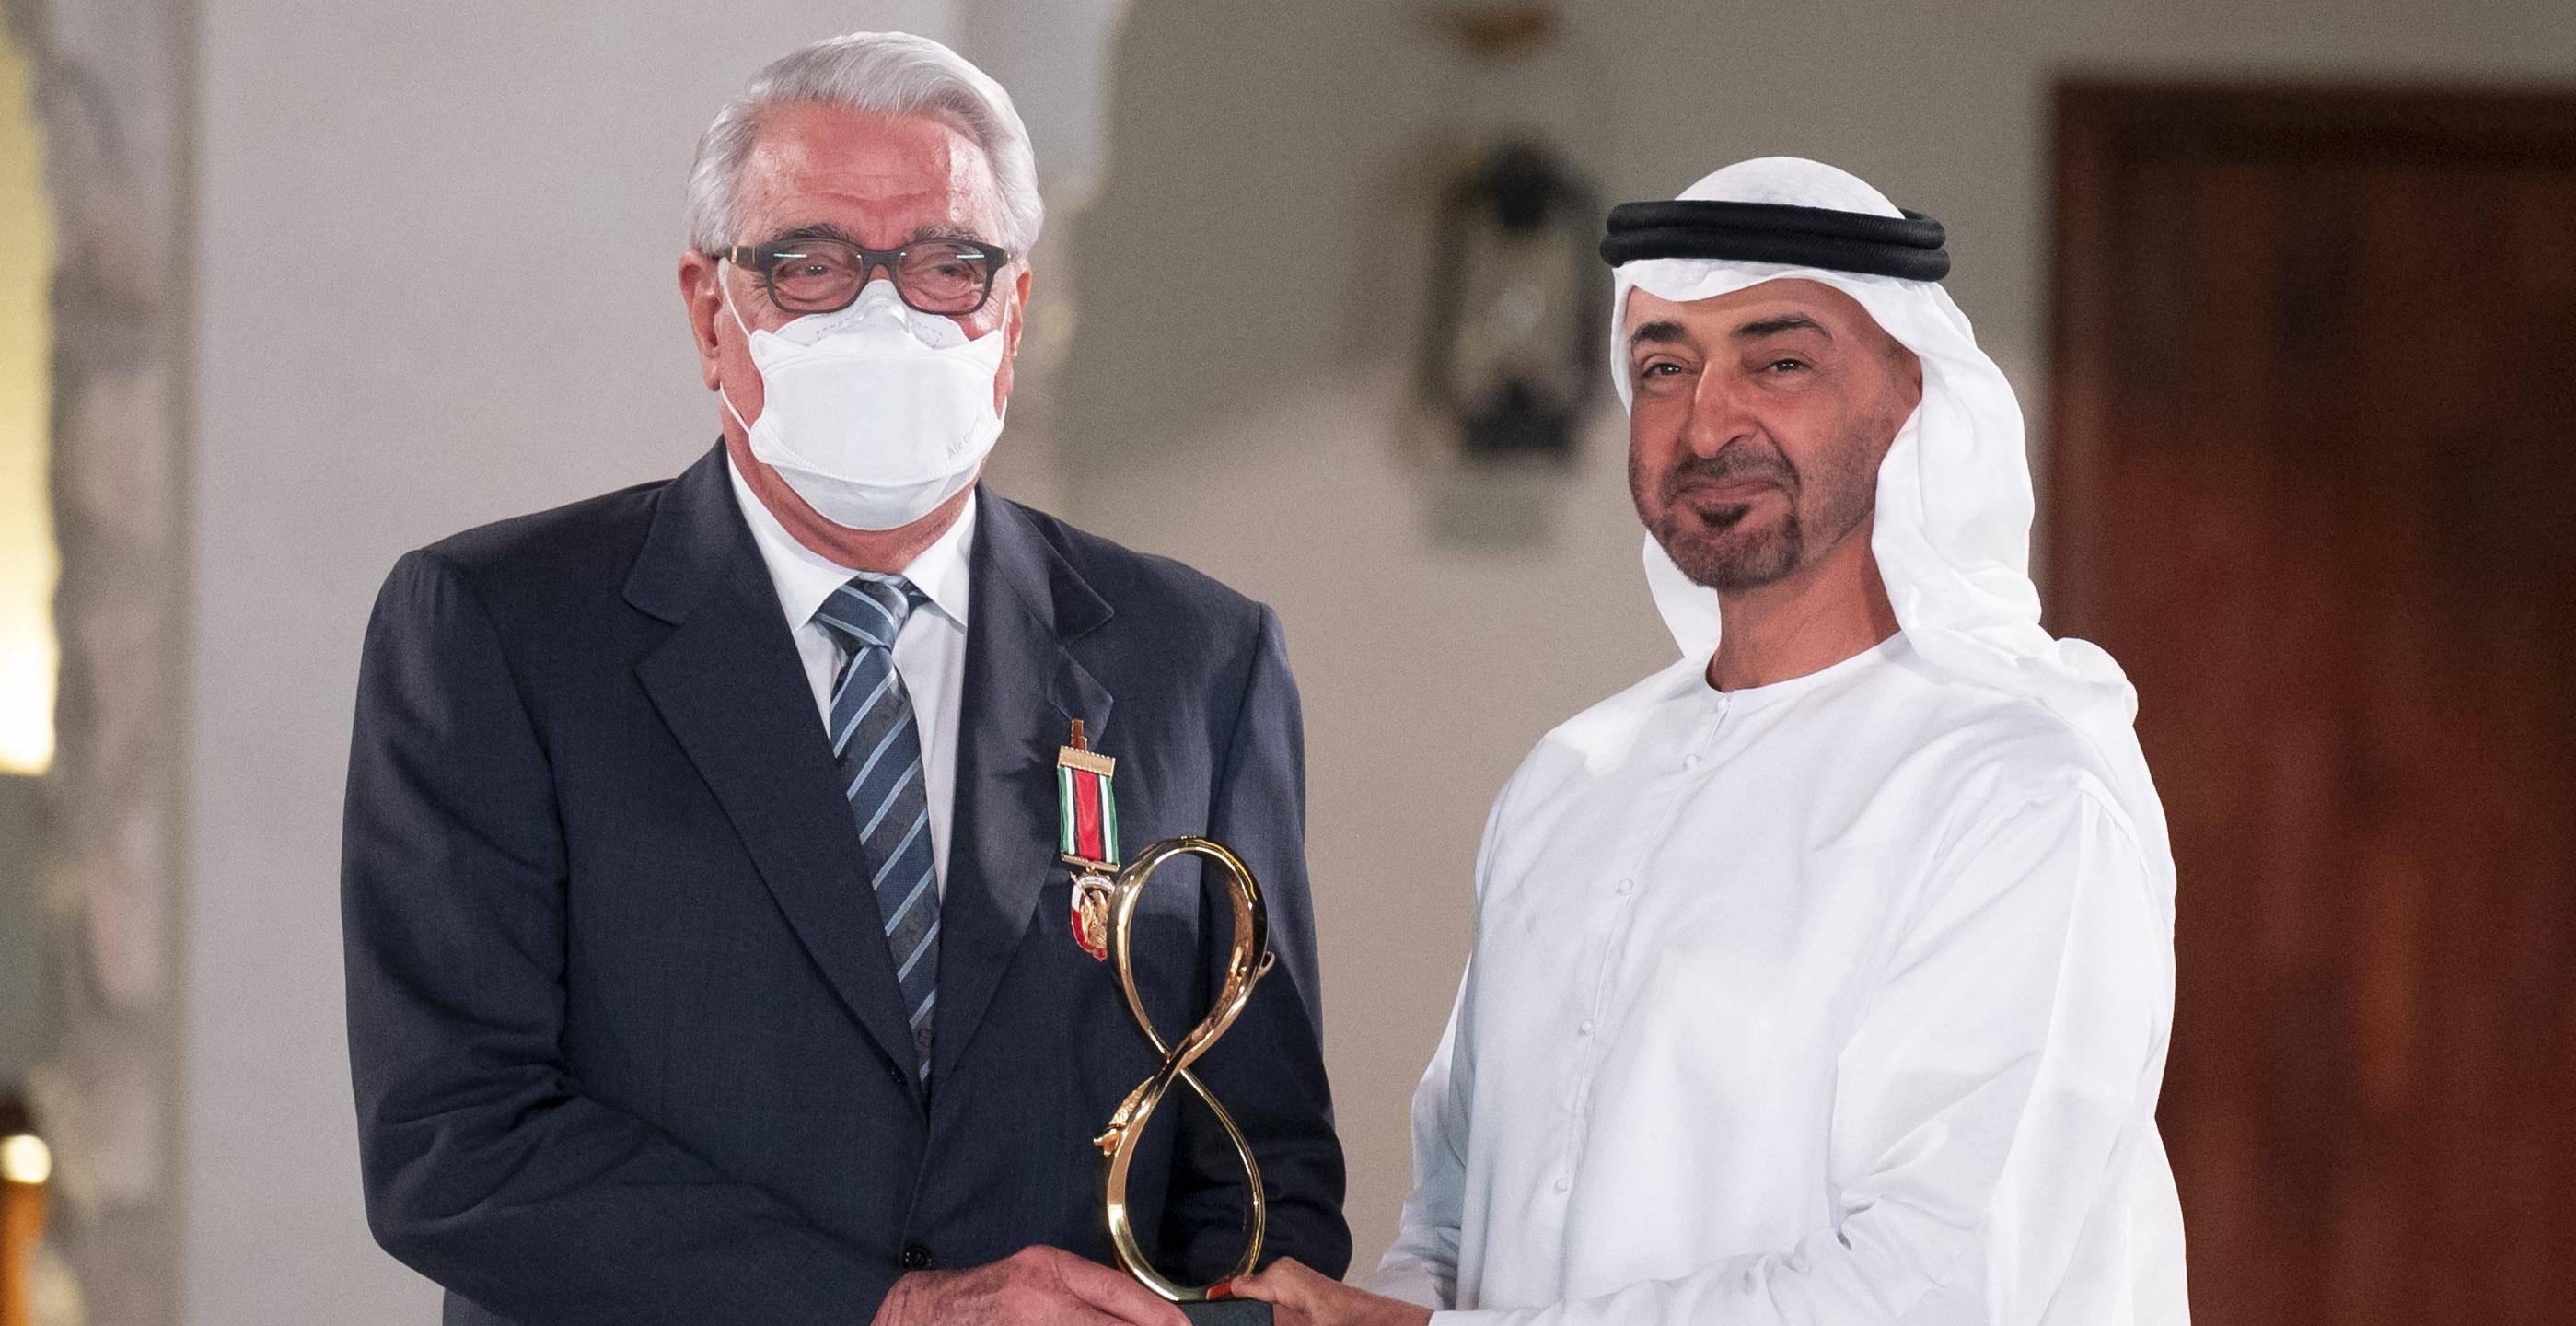 Newspapers called me a 'magician', says Abu Dhabi award-winning doctor - News